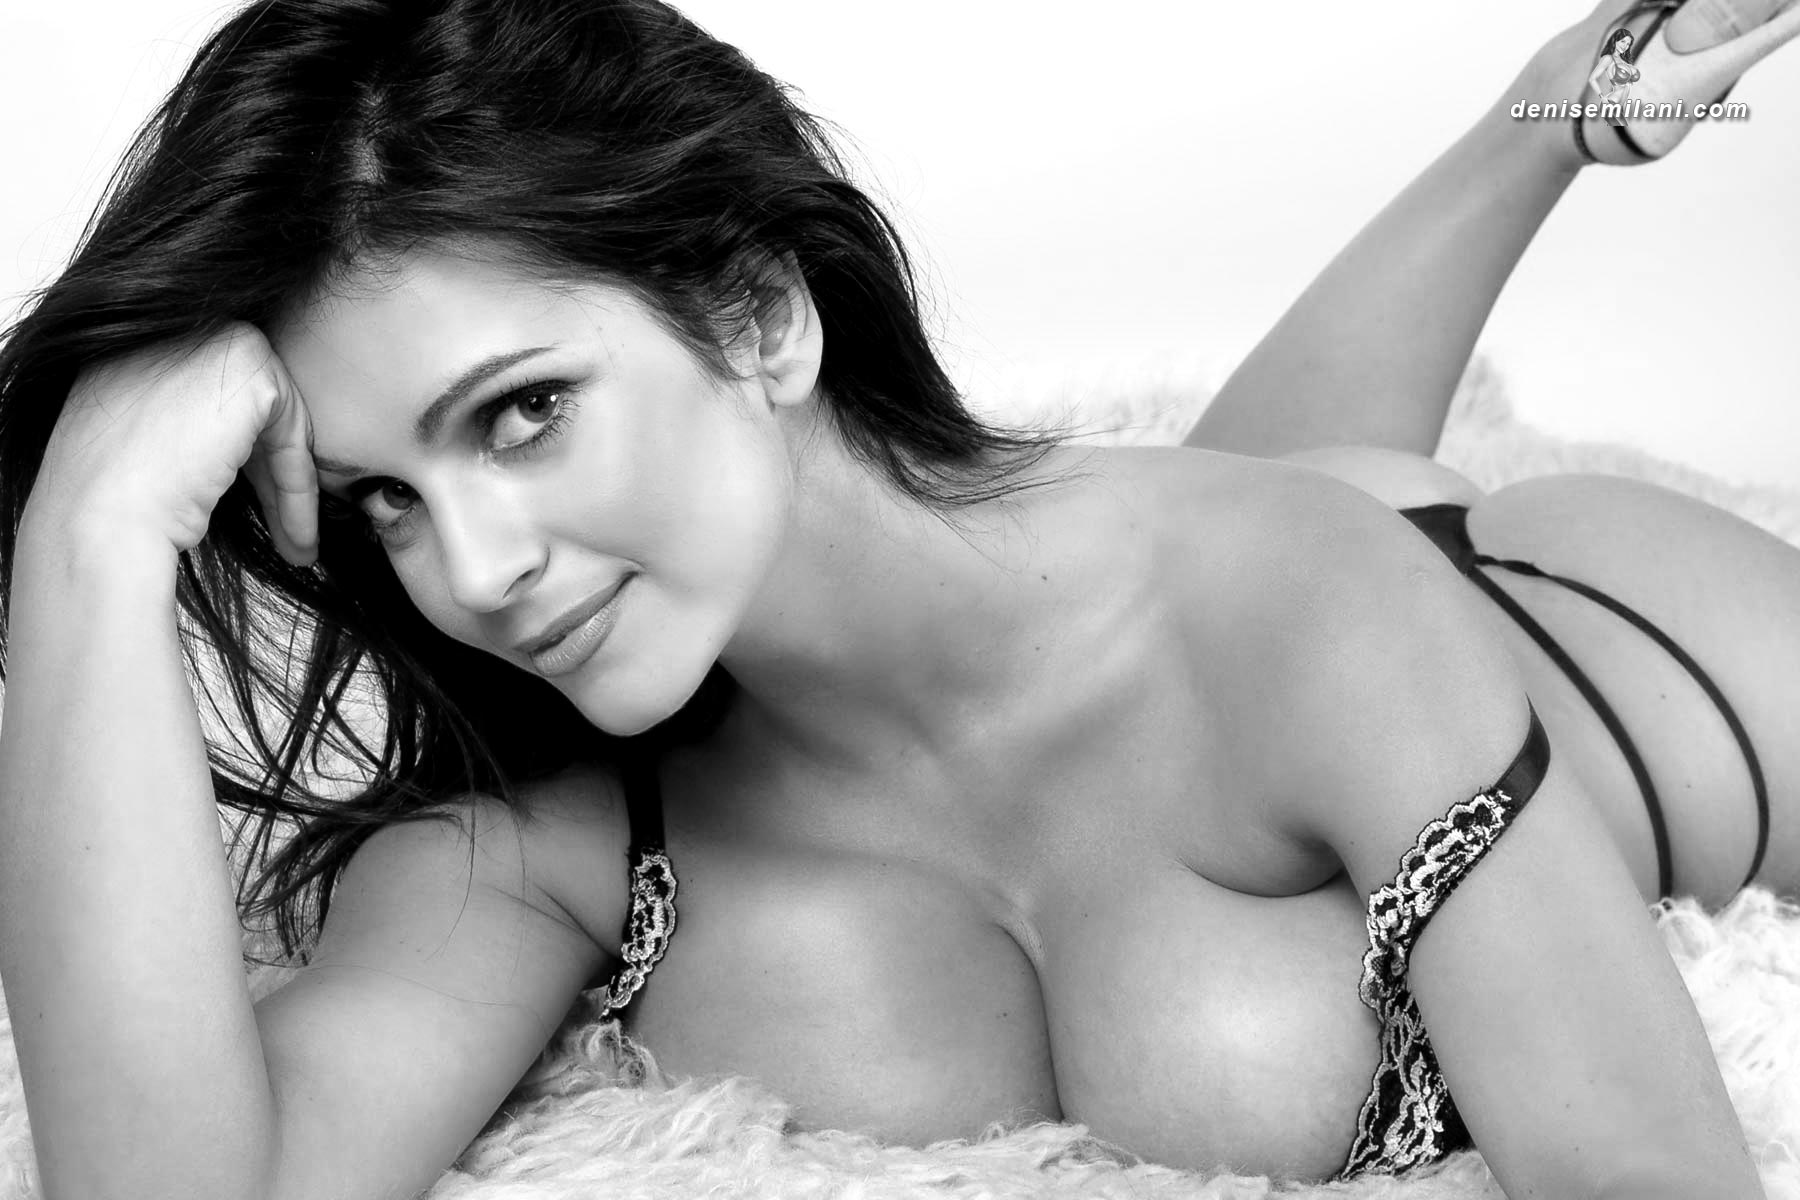 Фото порно денис милани, Denise Milani - все порно и секс фото модели 17 фотография